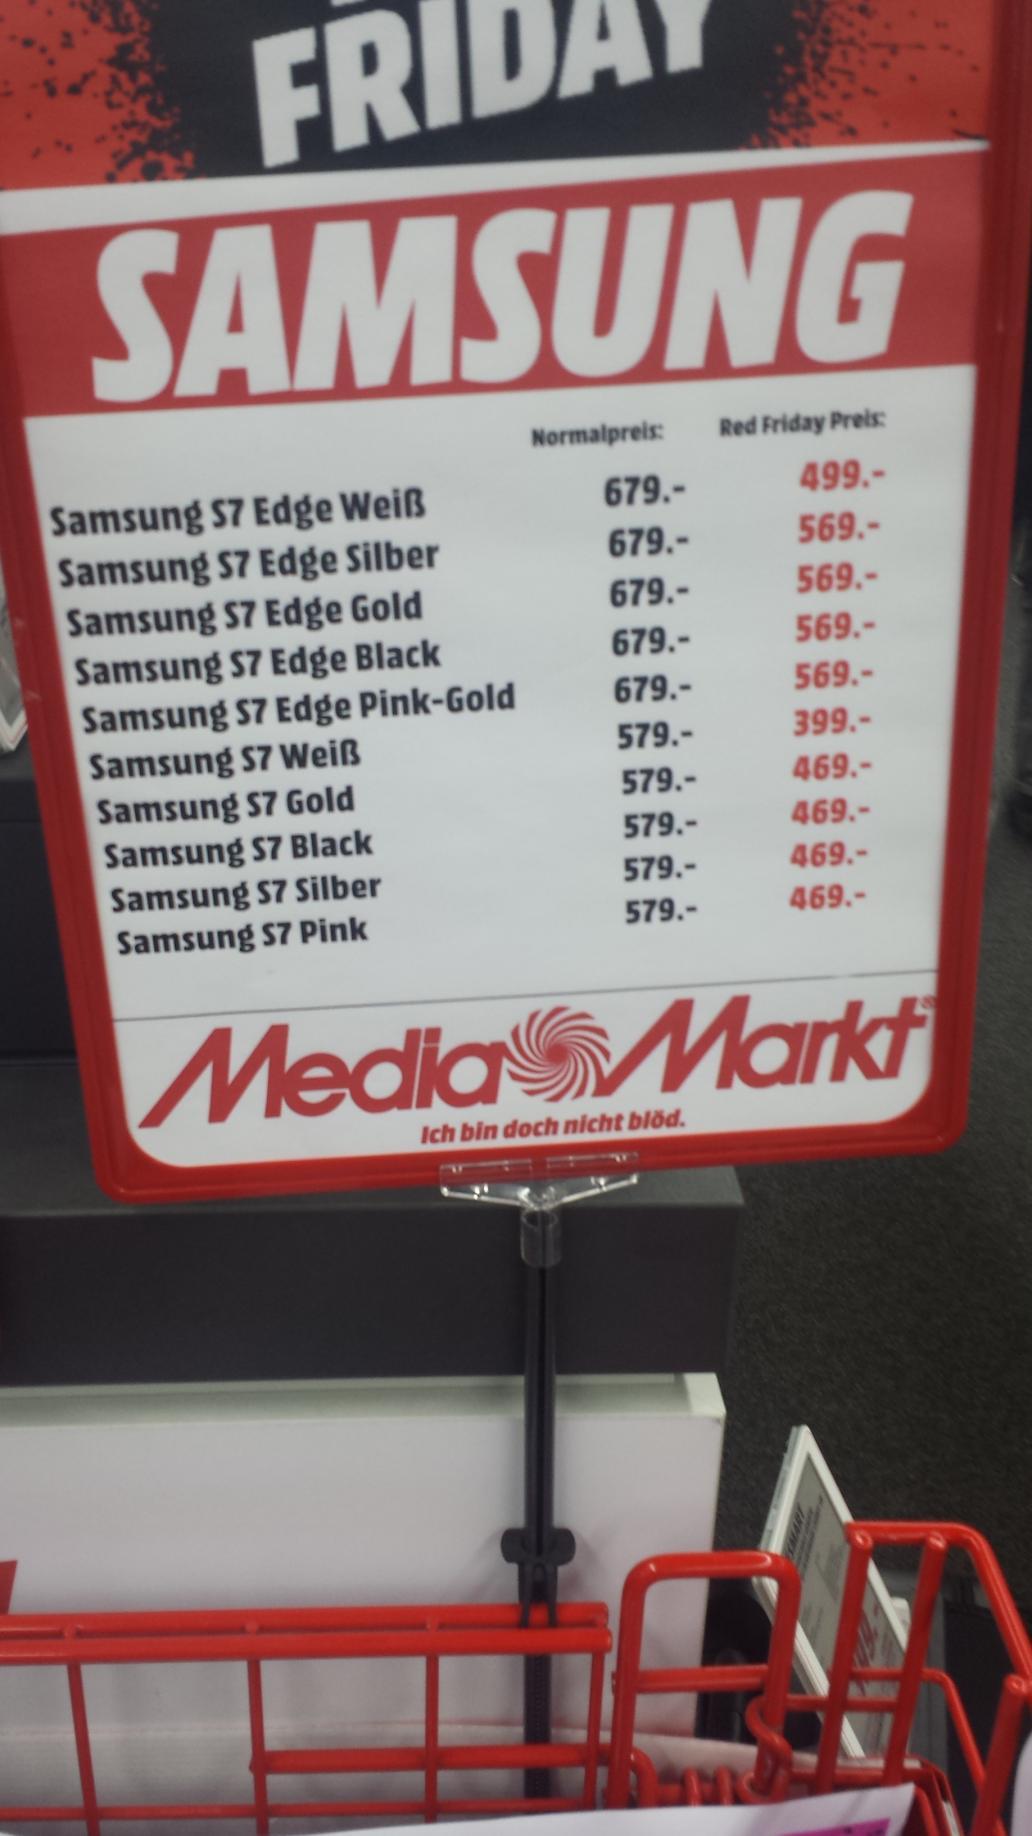 Smartphone Samsung Galaxy S7 à partir de 399€ et Galaxy S7 Edge